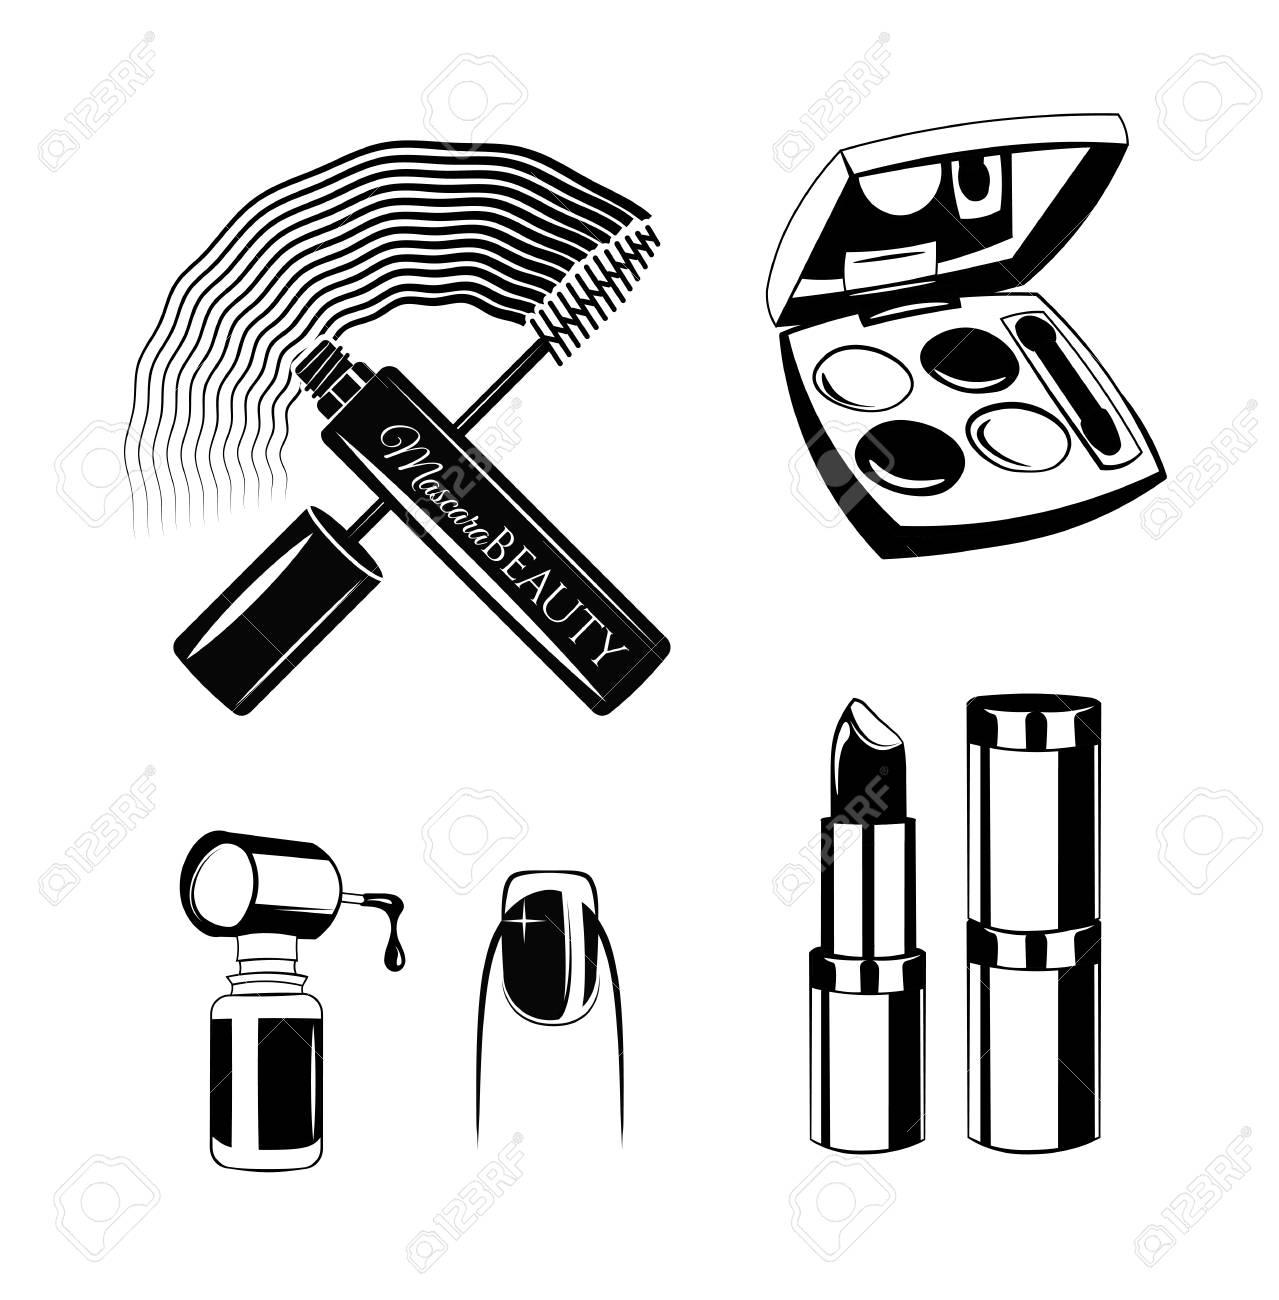 Cosmetics set drawing by hand  Nail polish, mascara, lipstick,